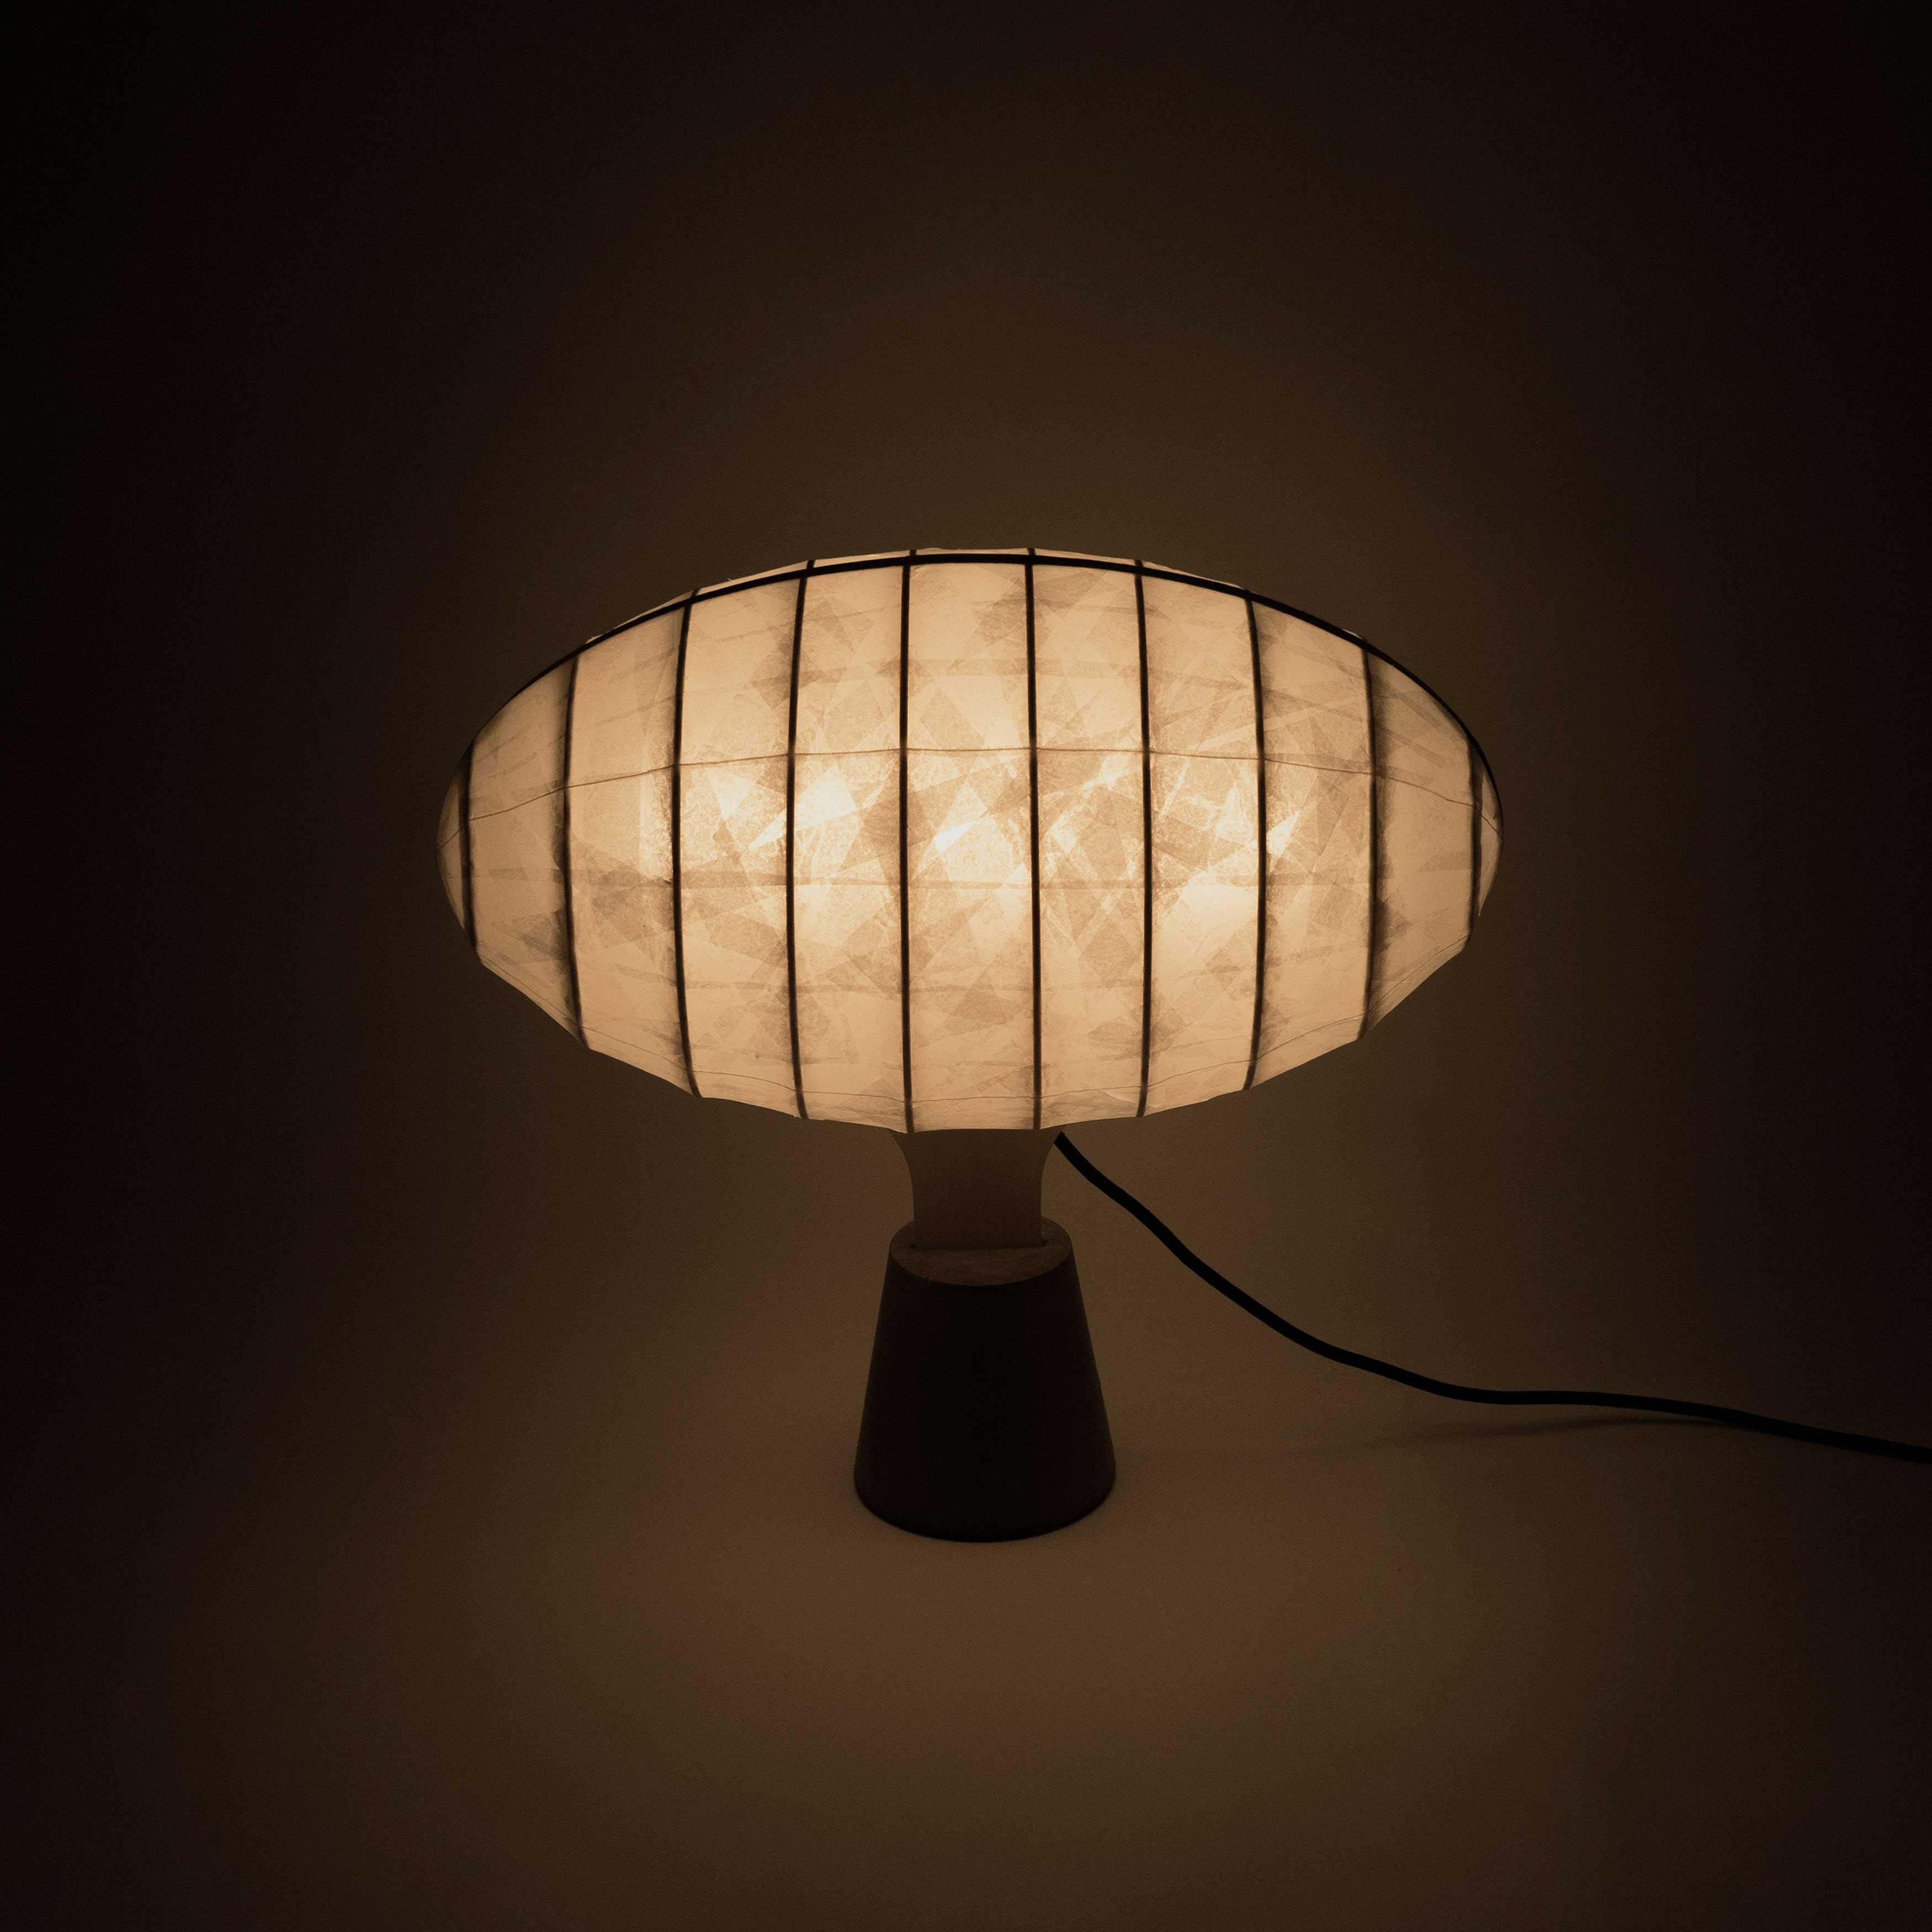 Zeppelin-lamp_02_AmbjornViking_crop